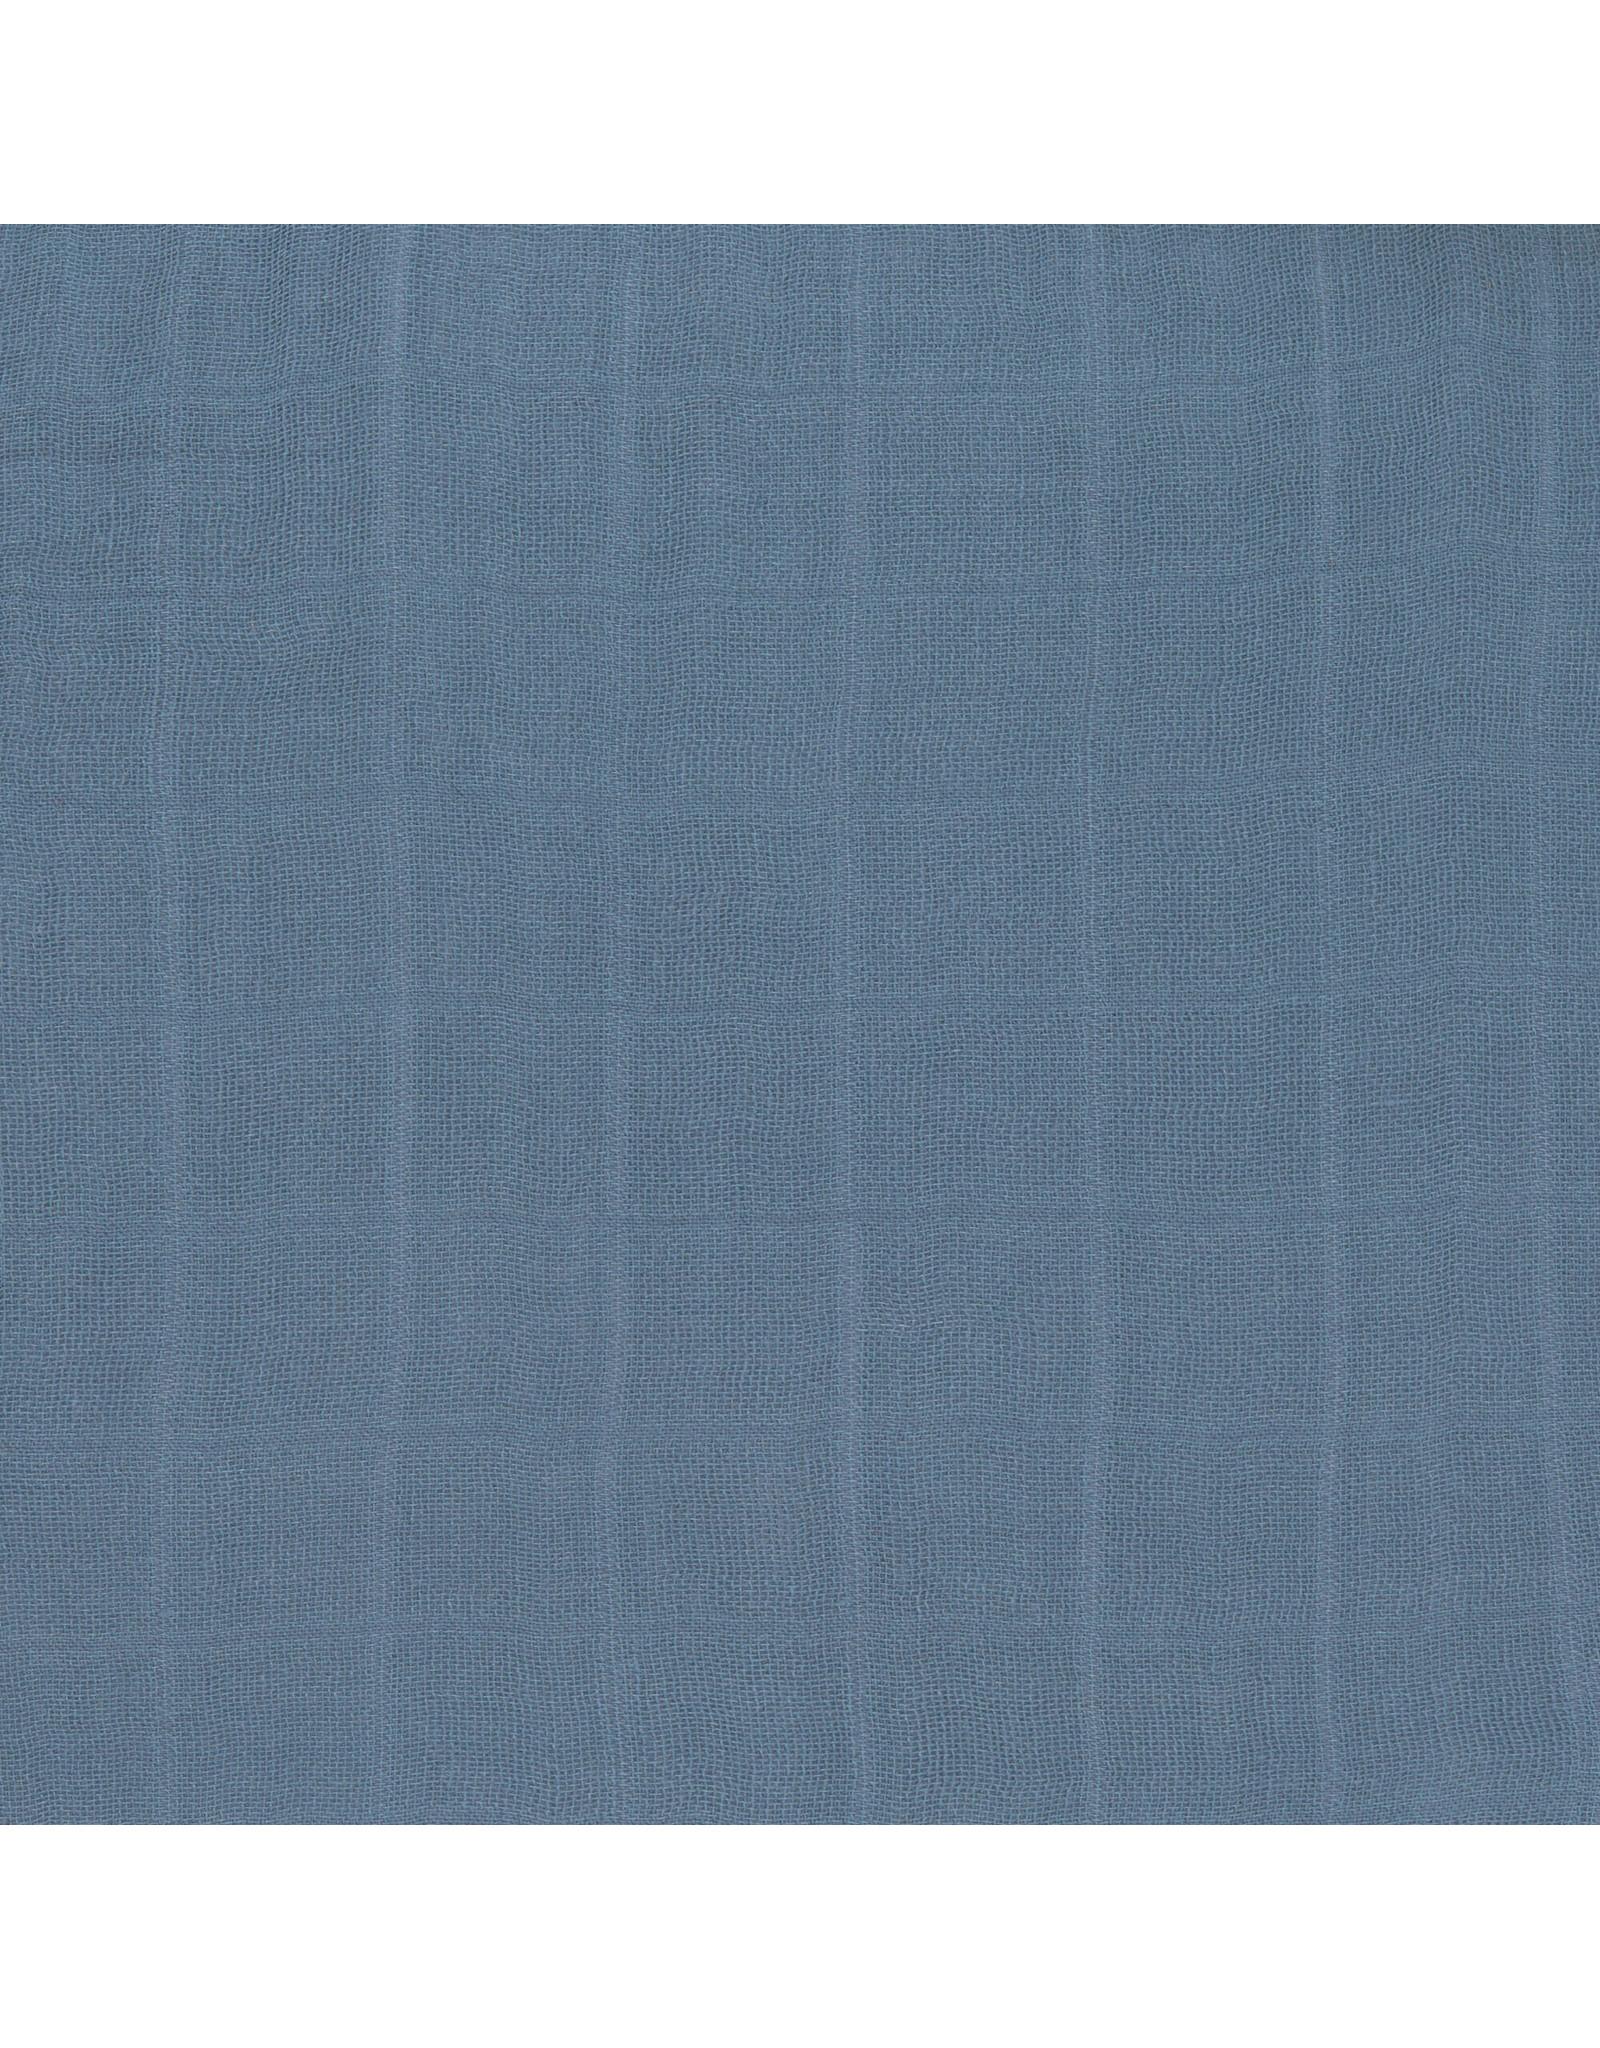 Lassig Lassig Soflt Swaddle L (80x80) Glama Lama Blue